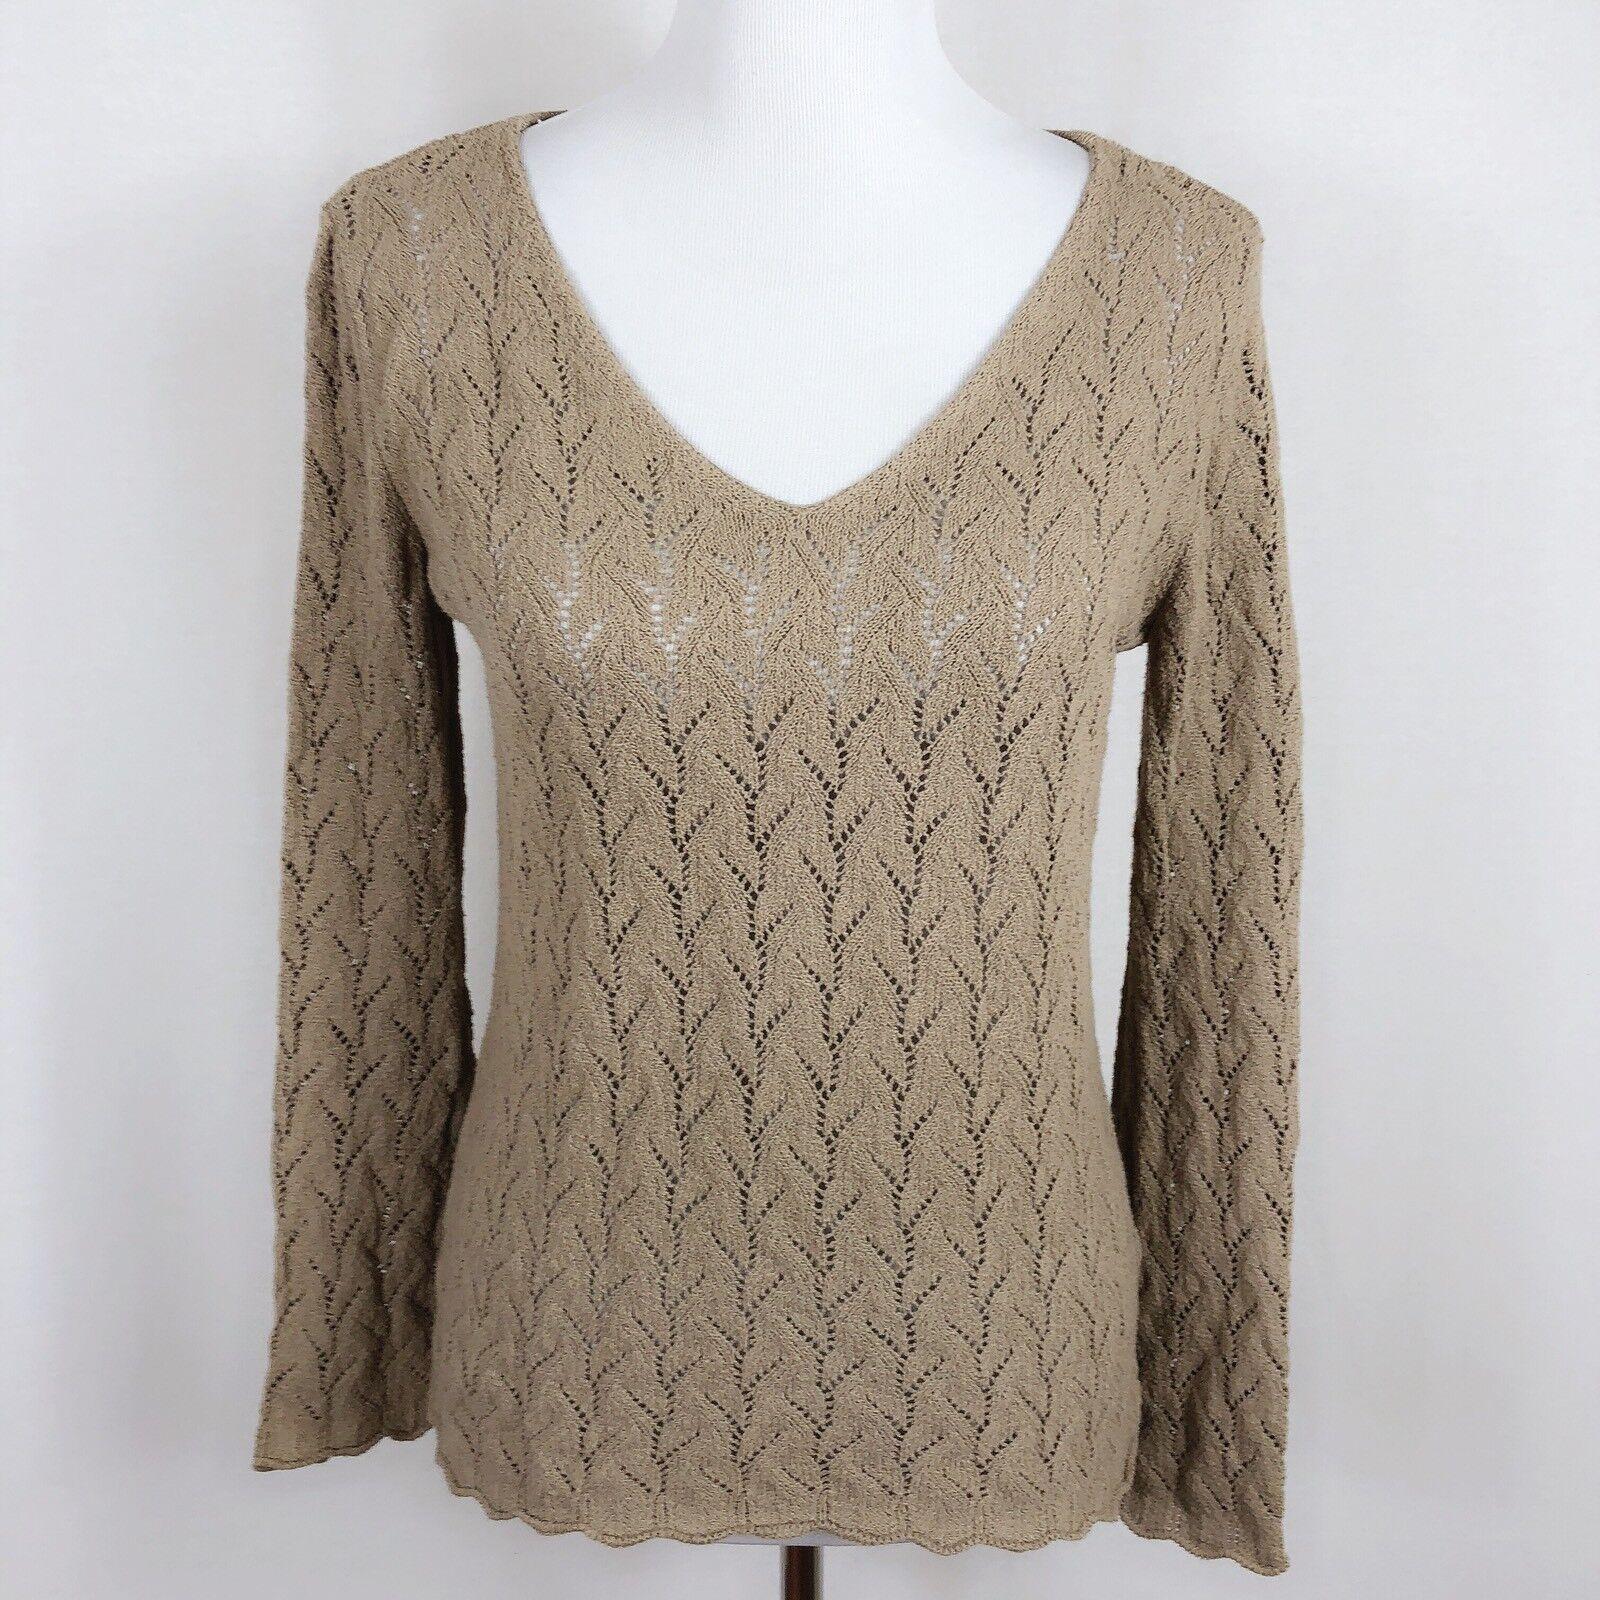 J.Jill Women Medium Khaki Brown Crochet Knit Sweater Long Sleeve Boho Festival